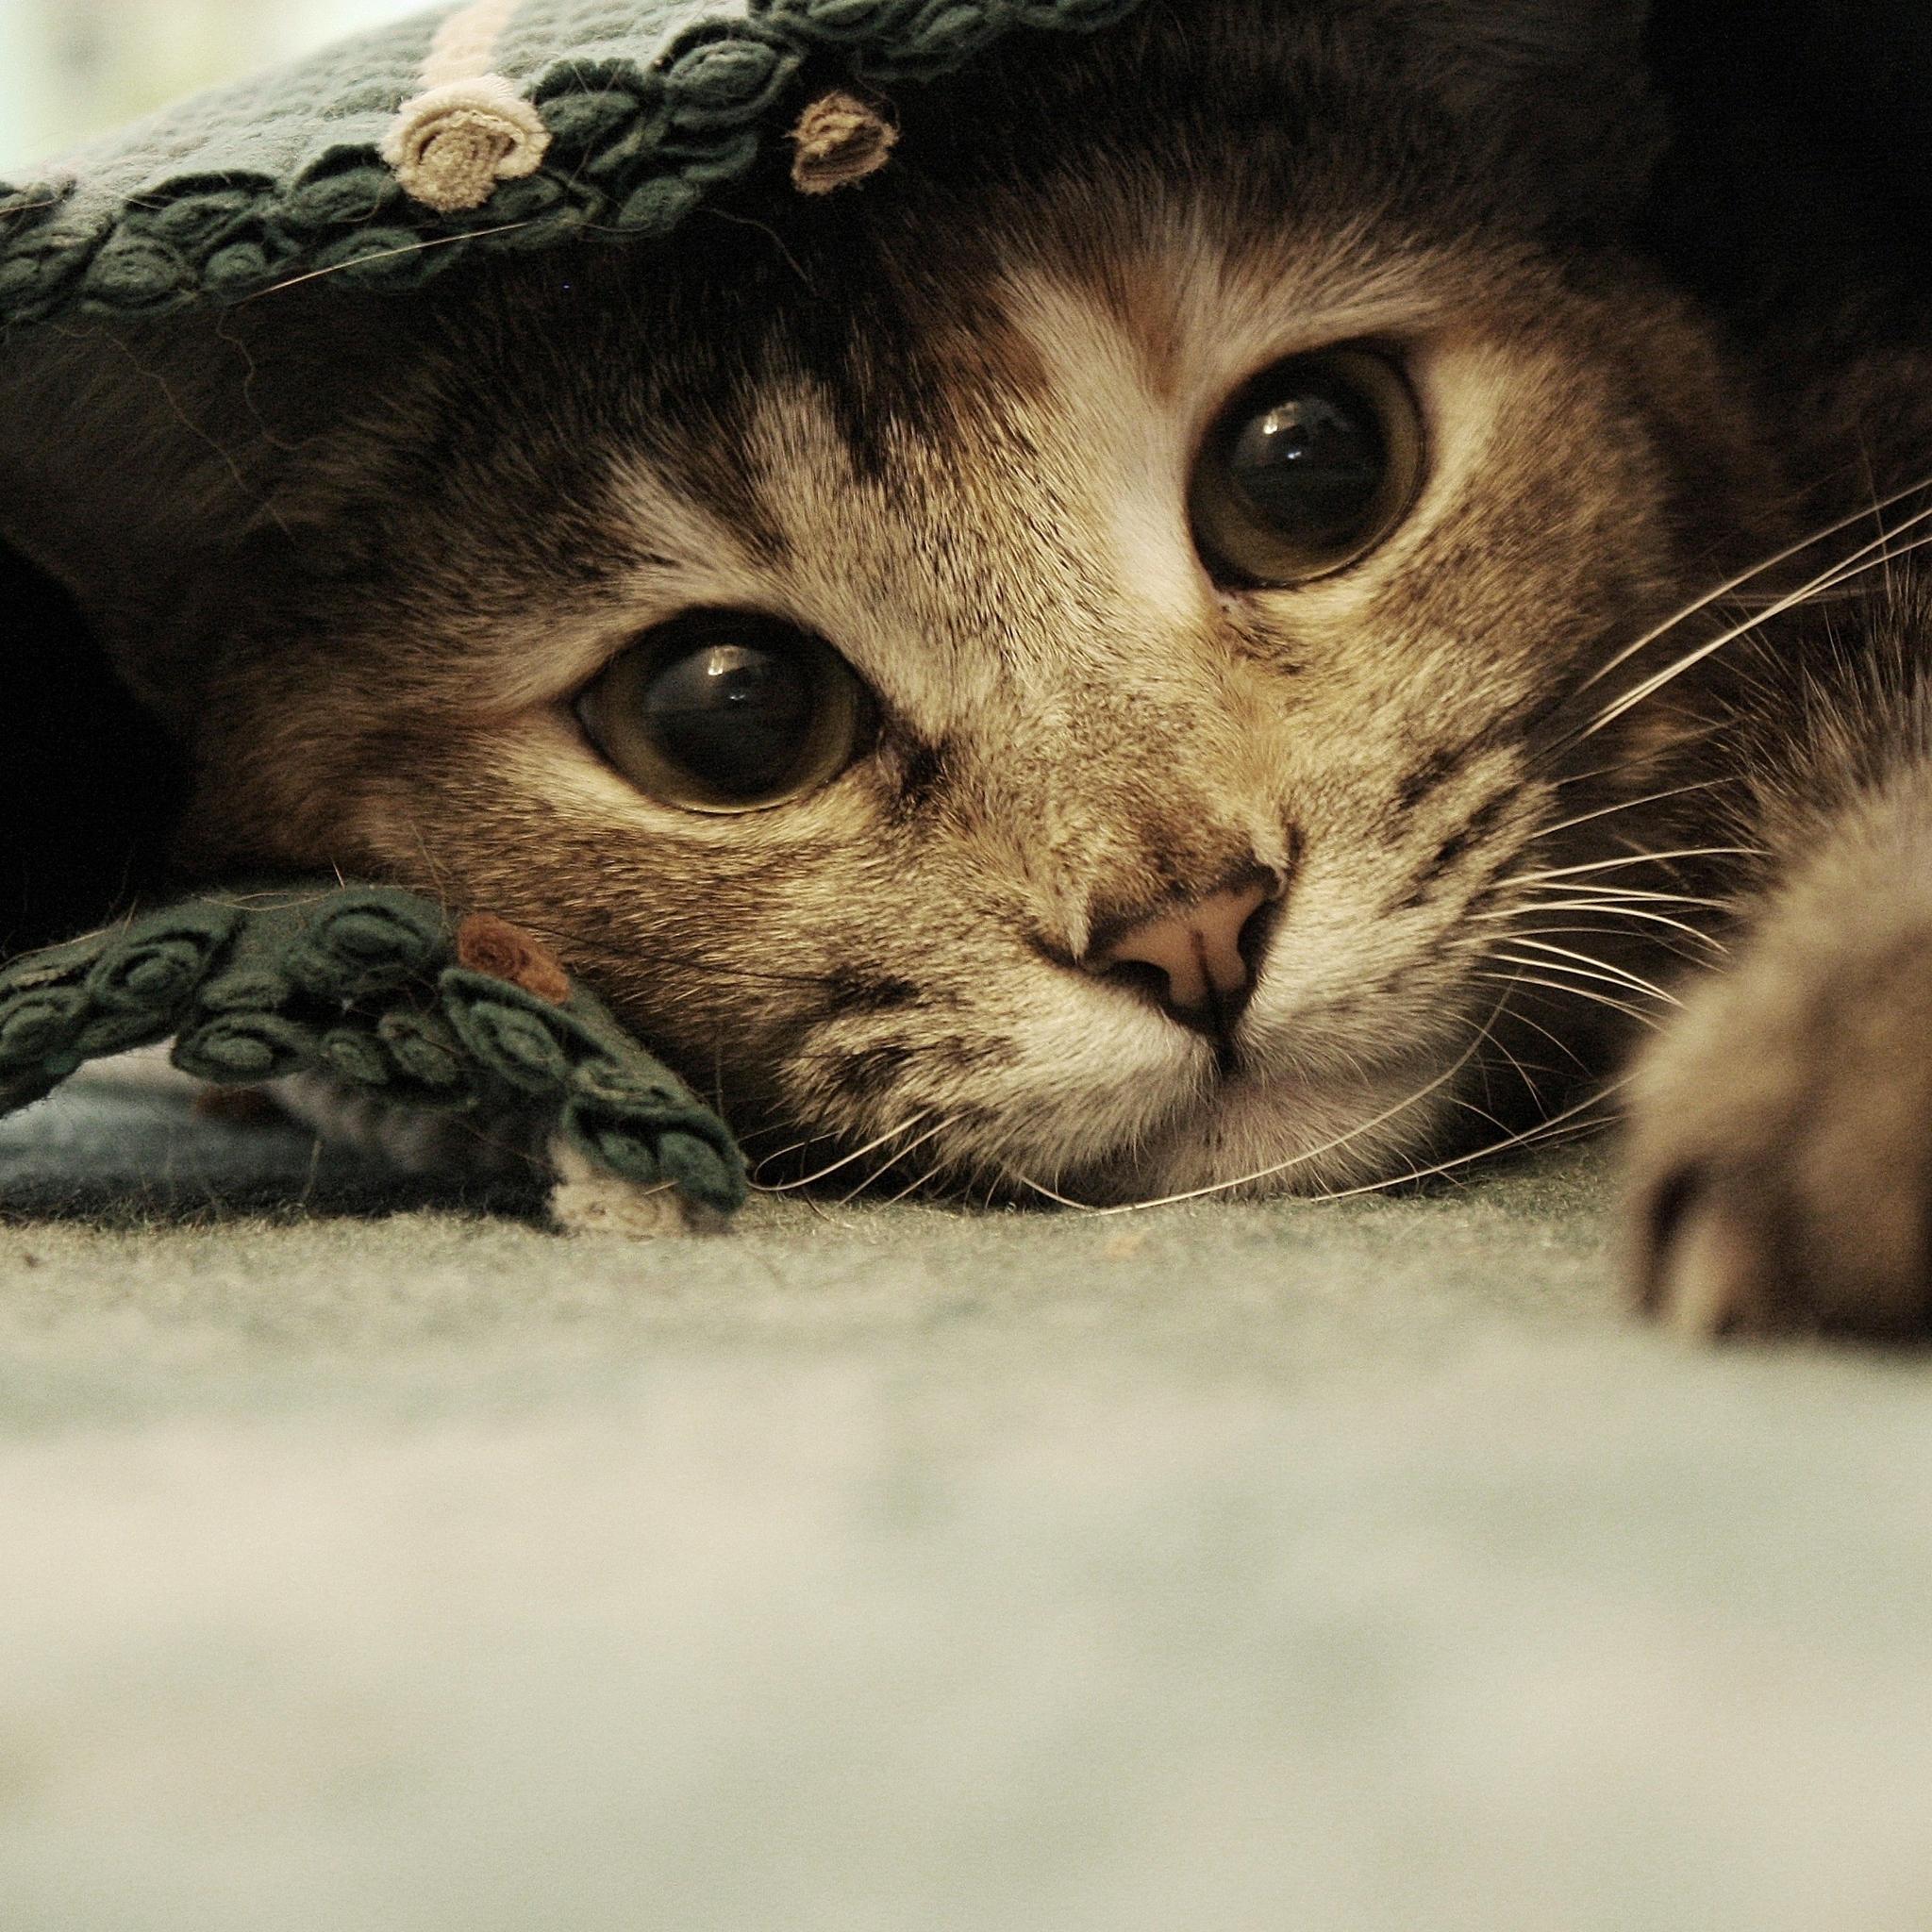 Cat-in-Sheet-3Wallpapers-iPad-Retina